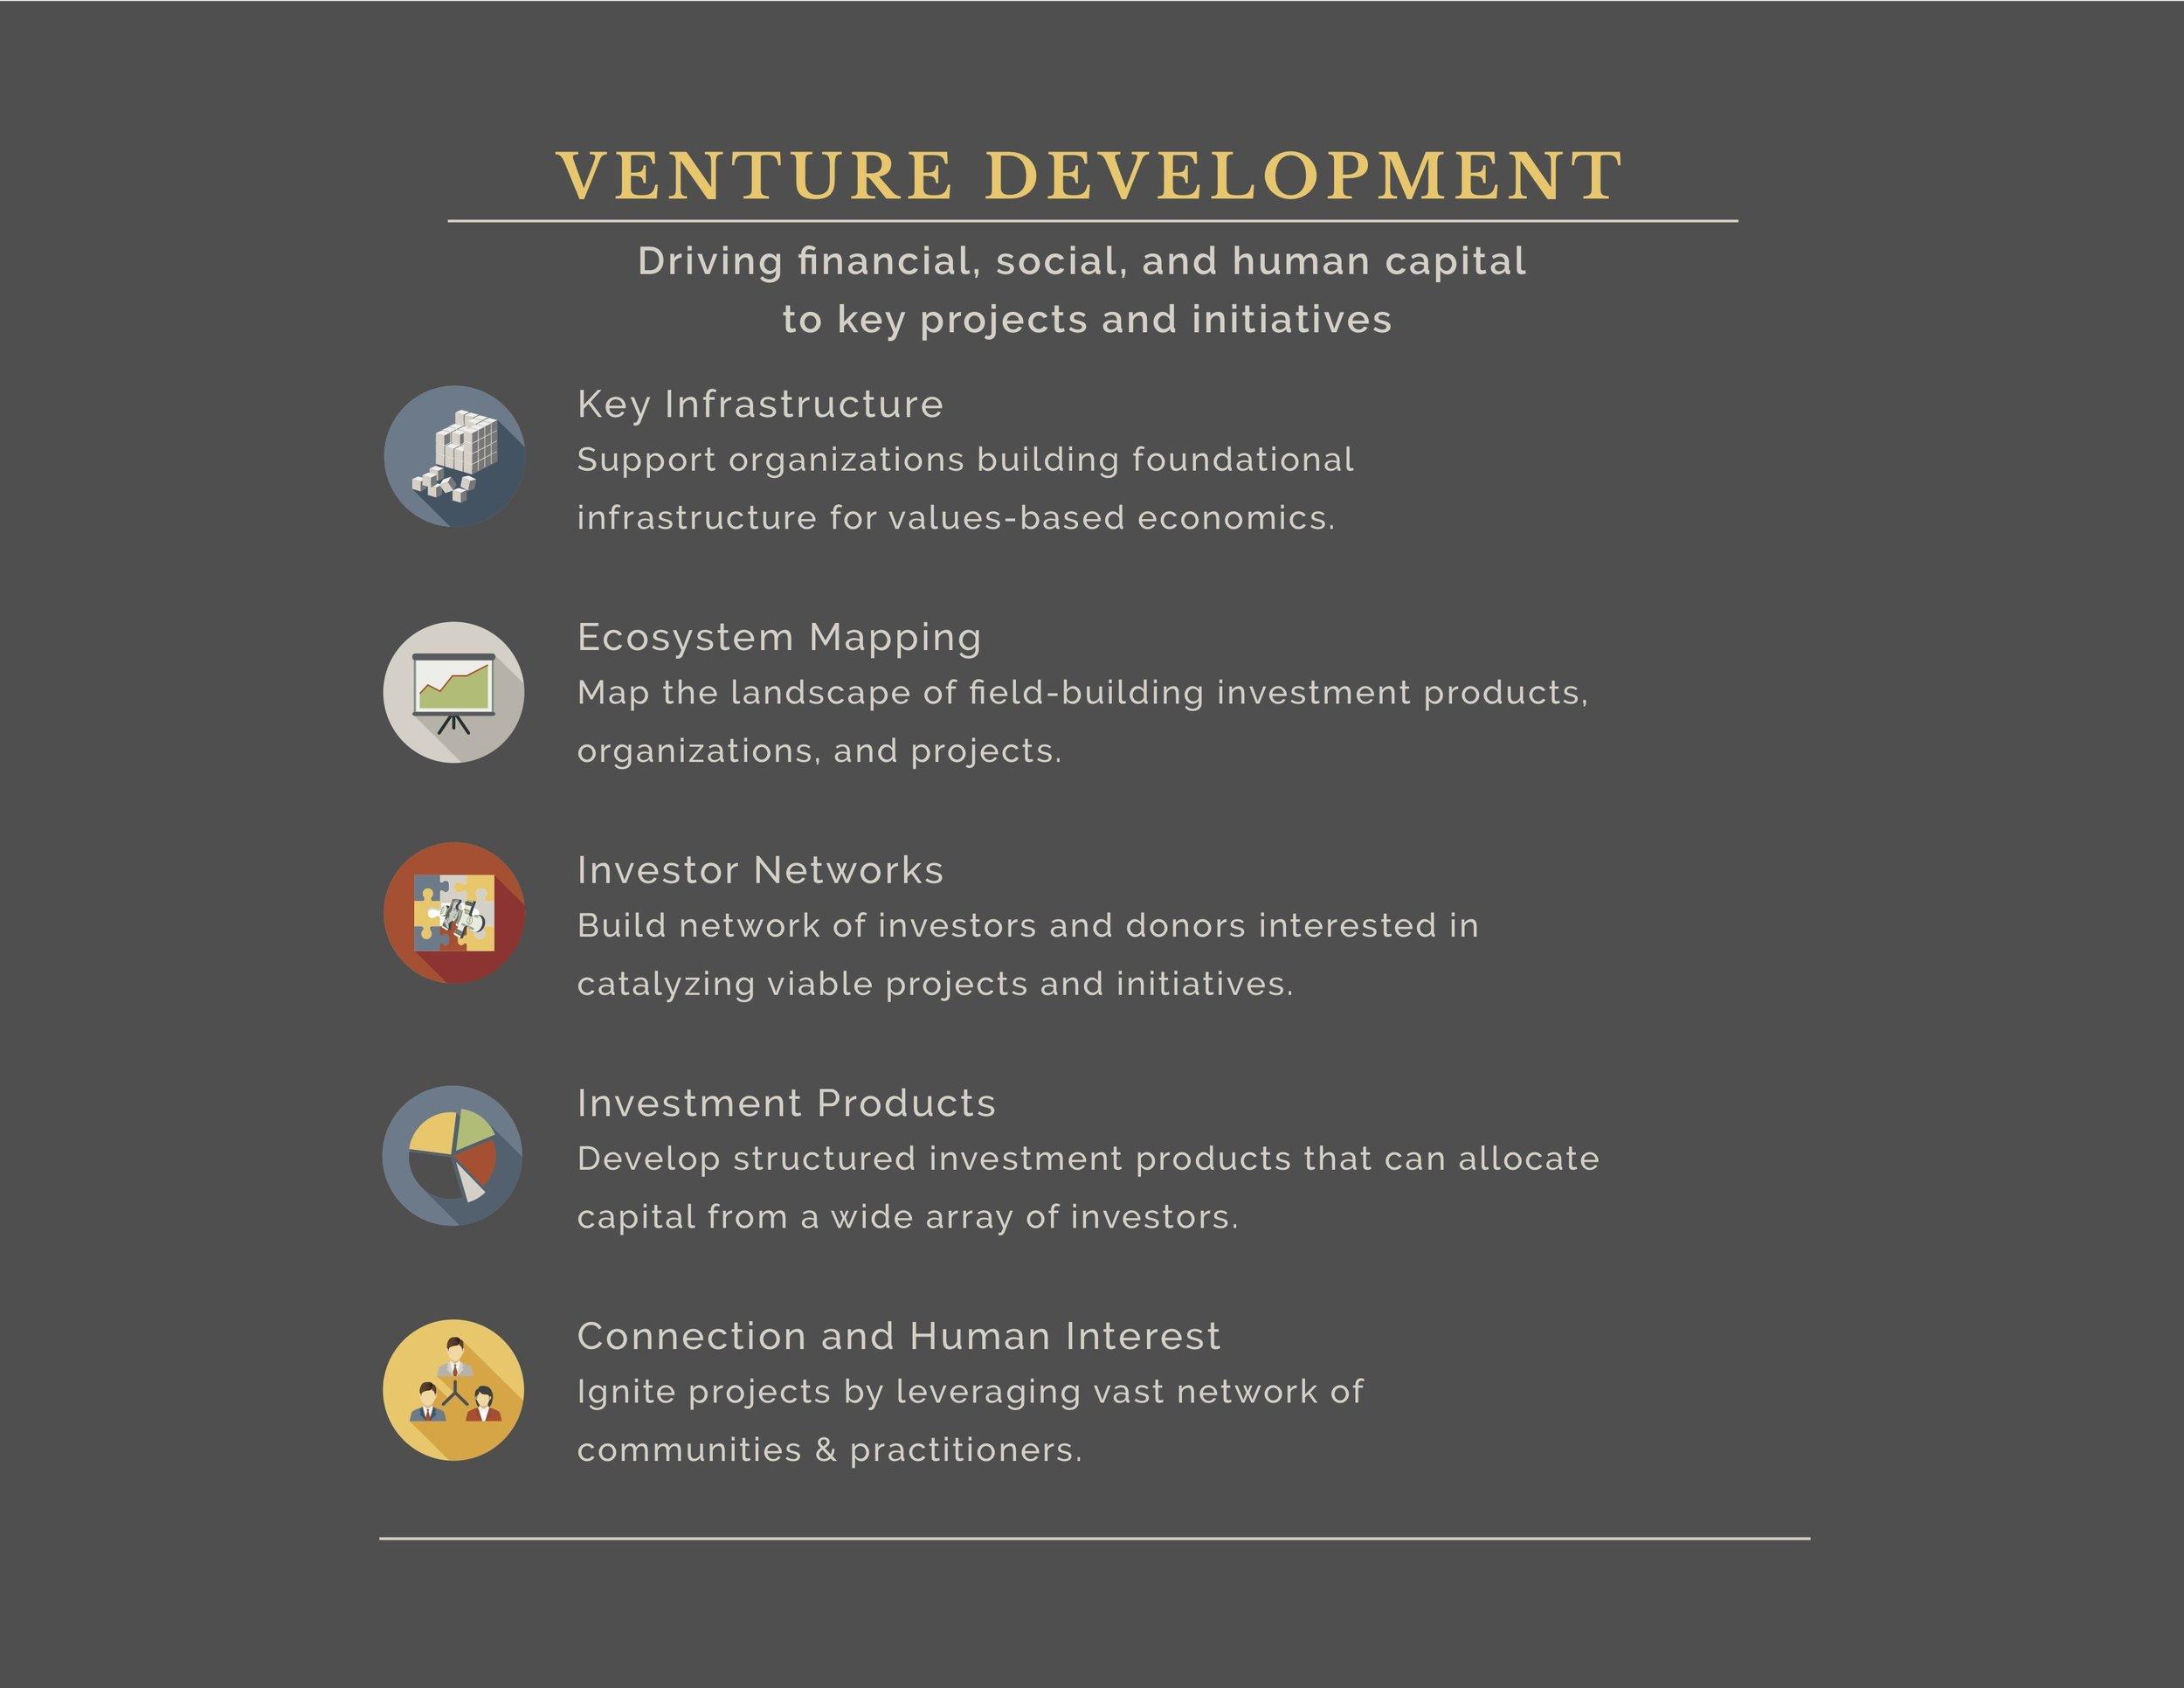 venture-development.jpg